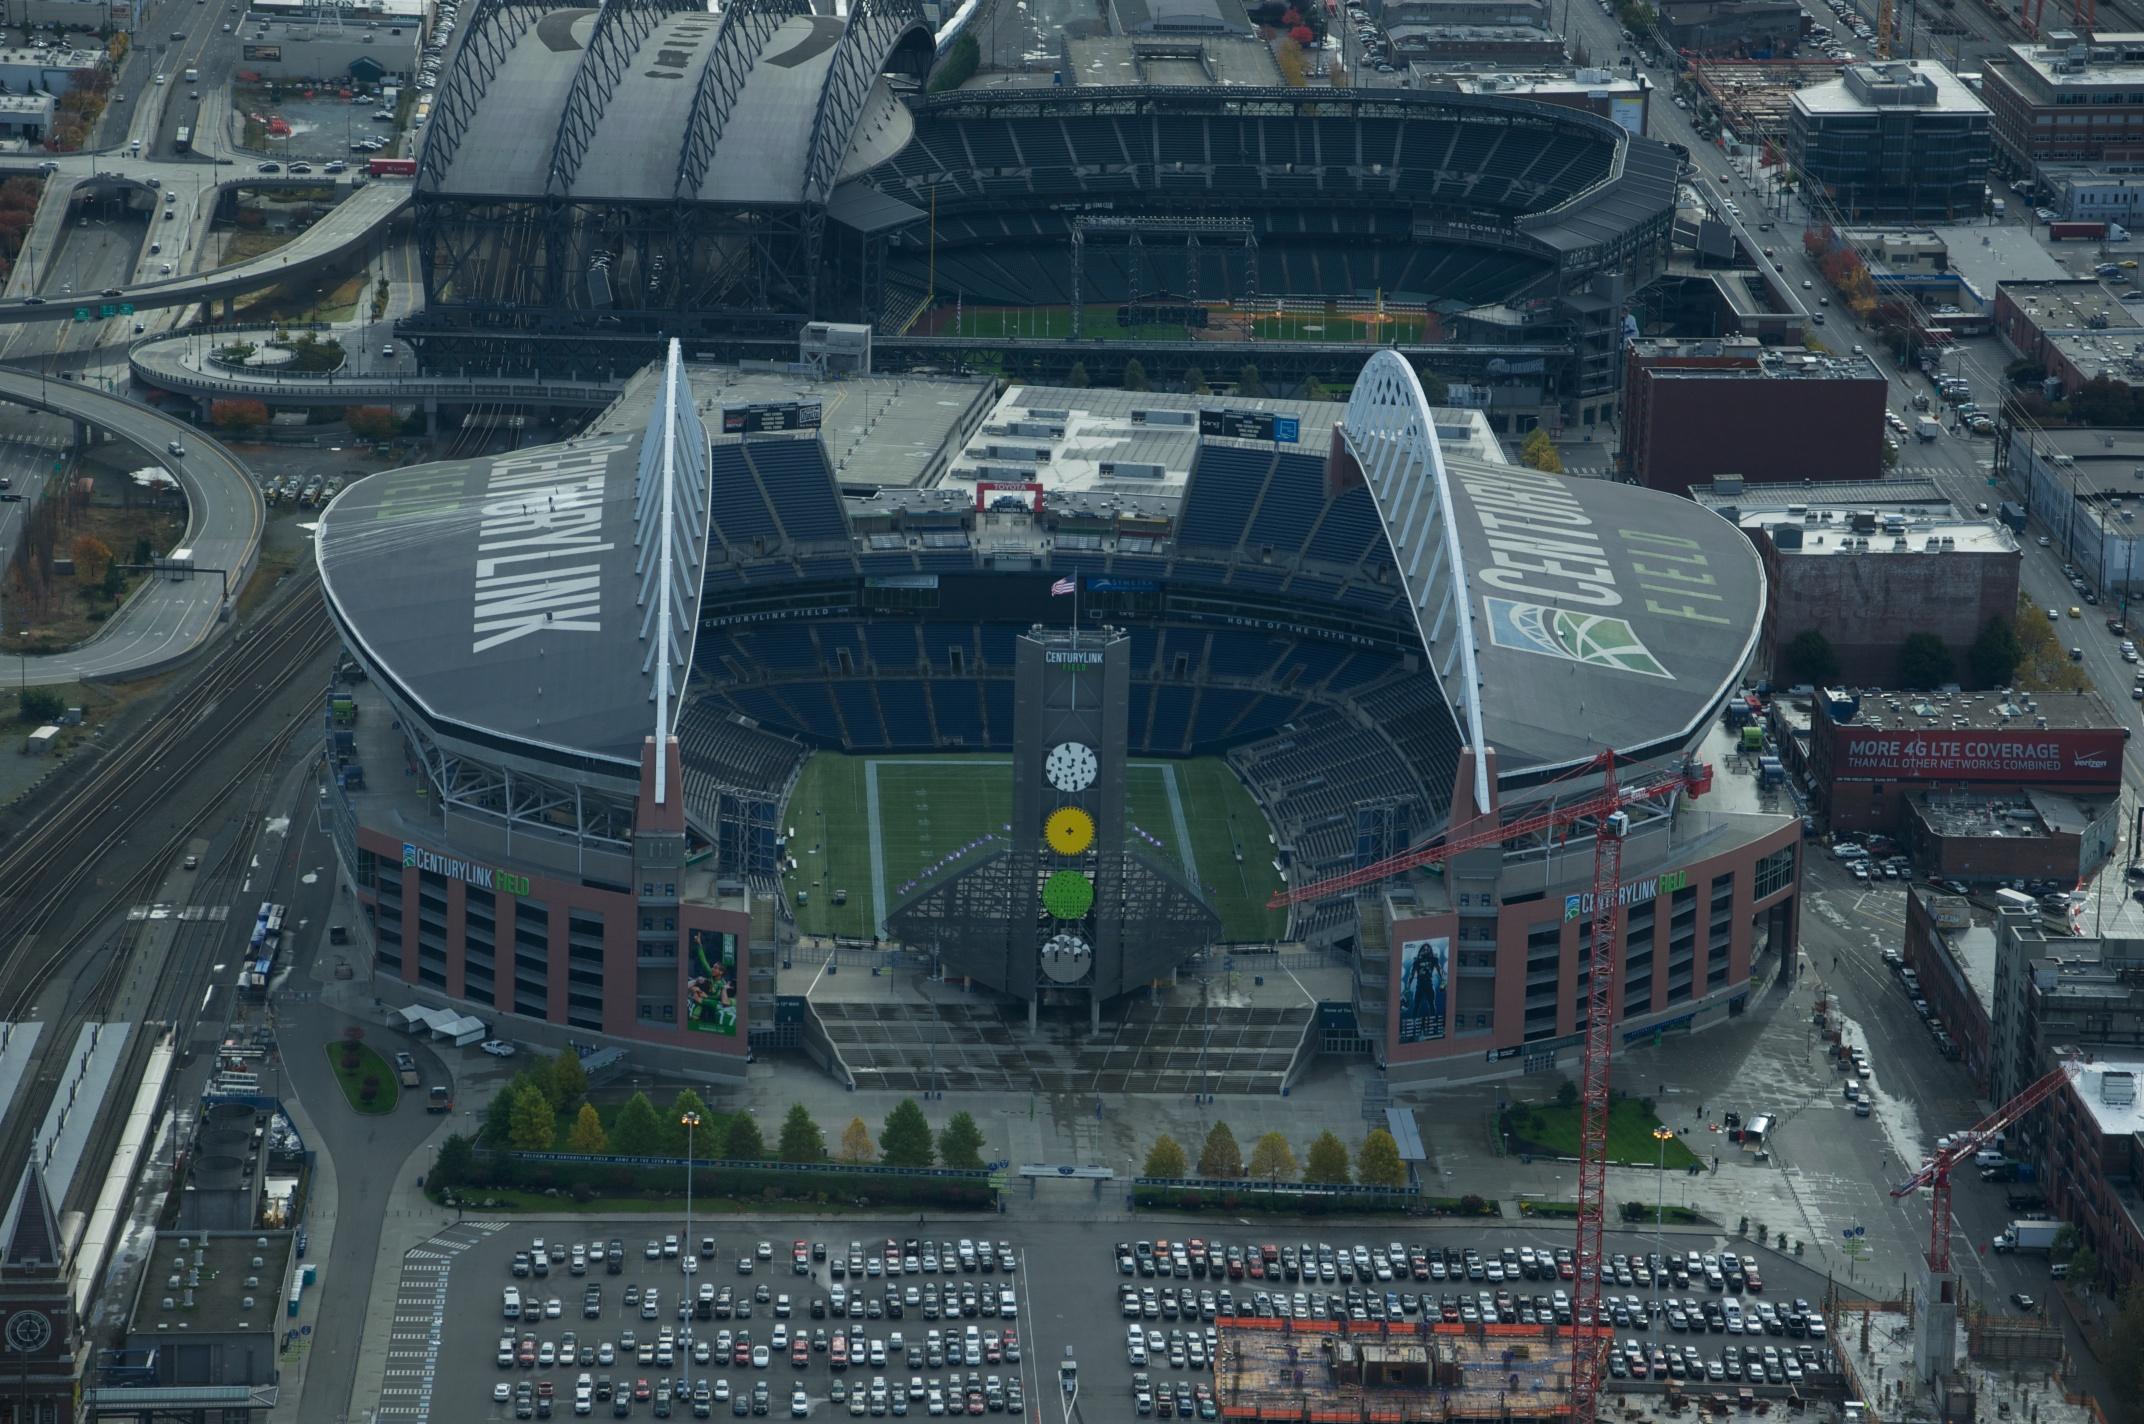 Seattle Seahawks nfl football sport stadium architecture building 2144x1424